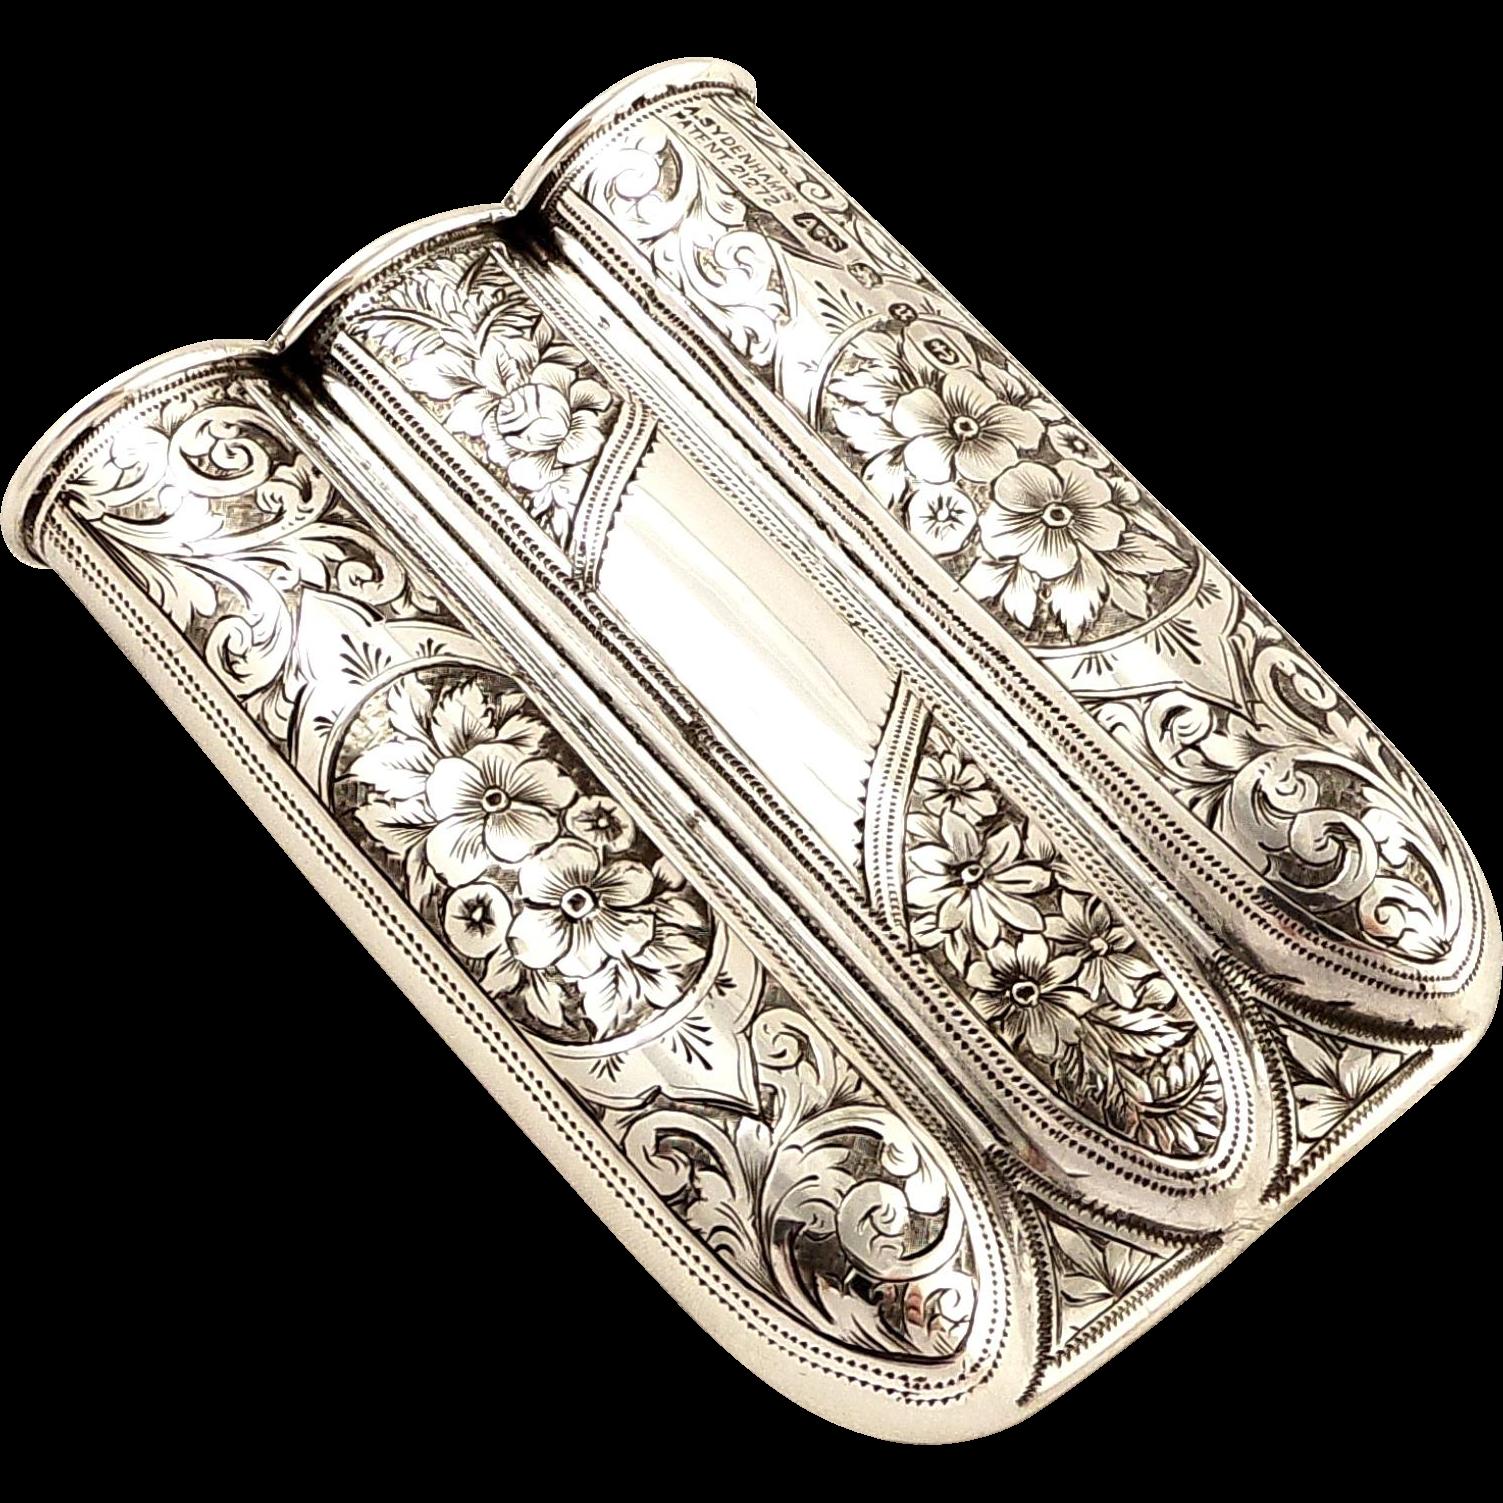 30316e46acfd Antique Victorian Sterling Silver Cigar Case 1894 - Sydenhams Patent ...